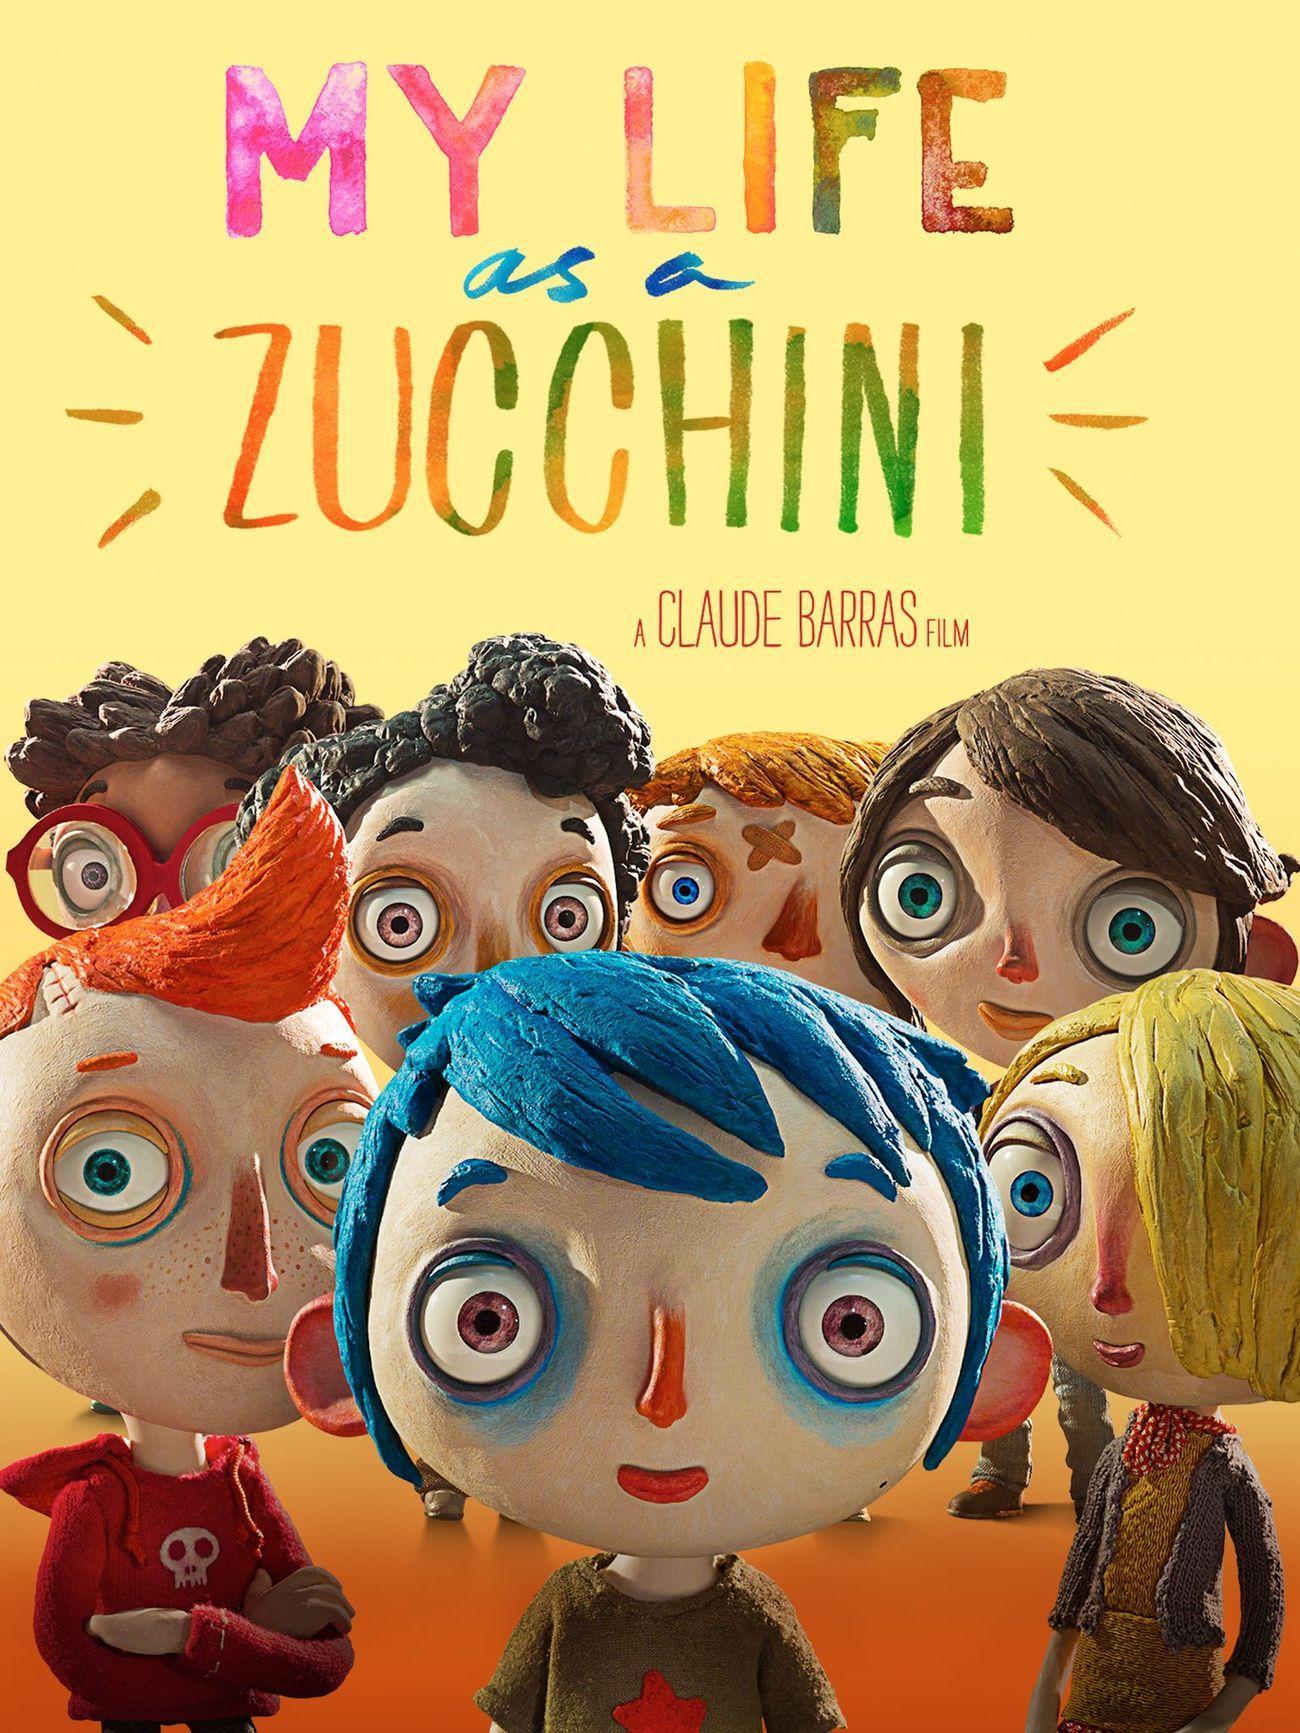 My Life As A Zucchini (2016) [BluRay] 1080p تحميل تورنت 2 arabp2p.com